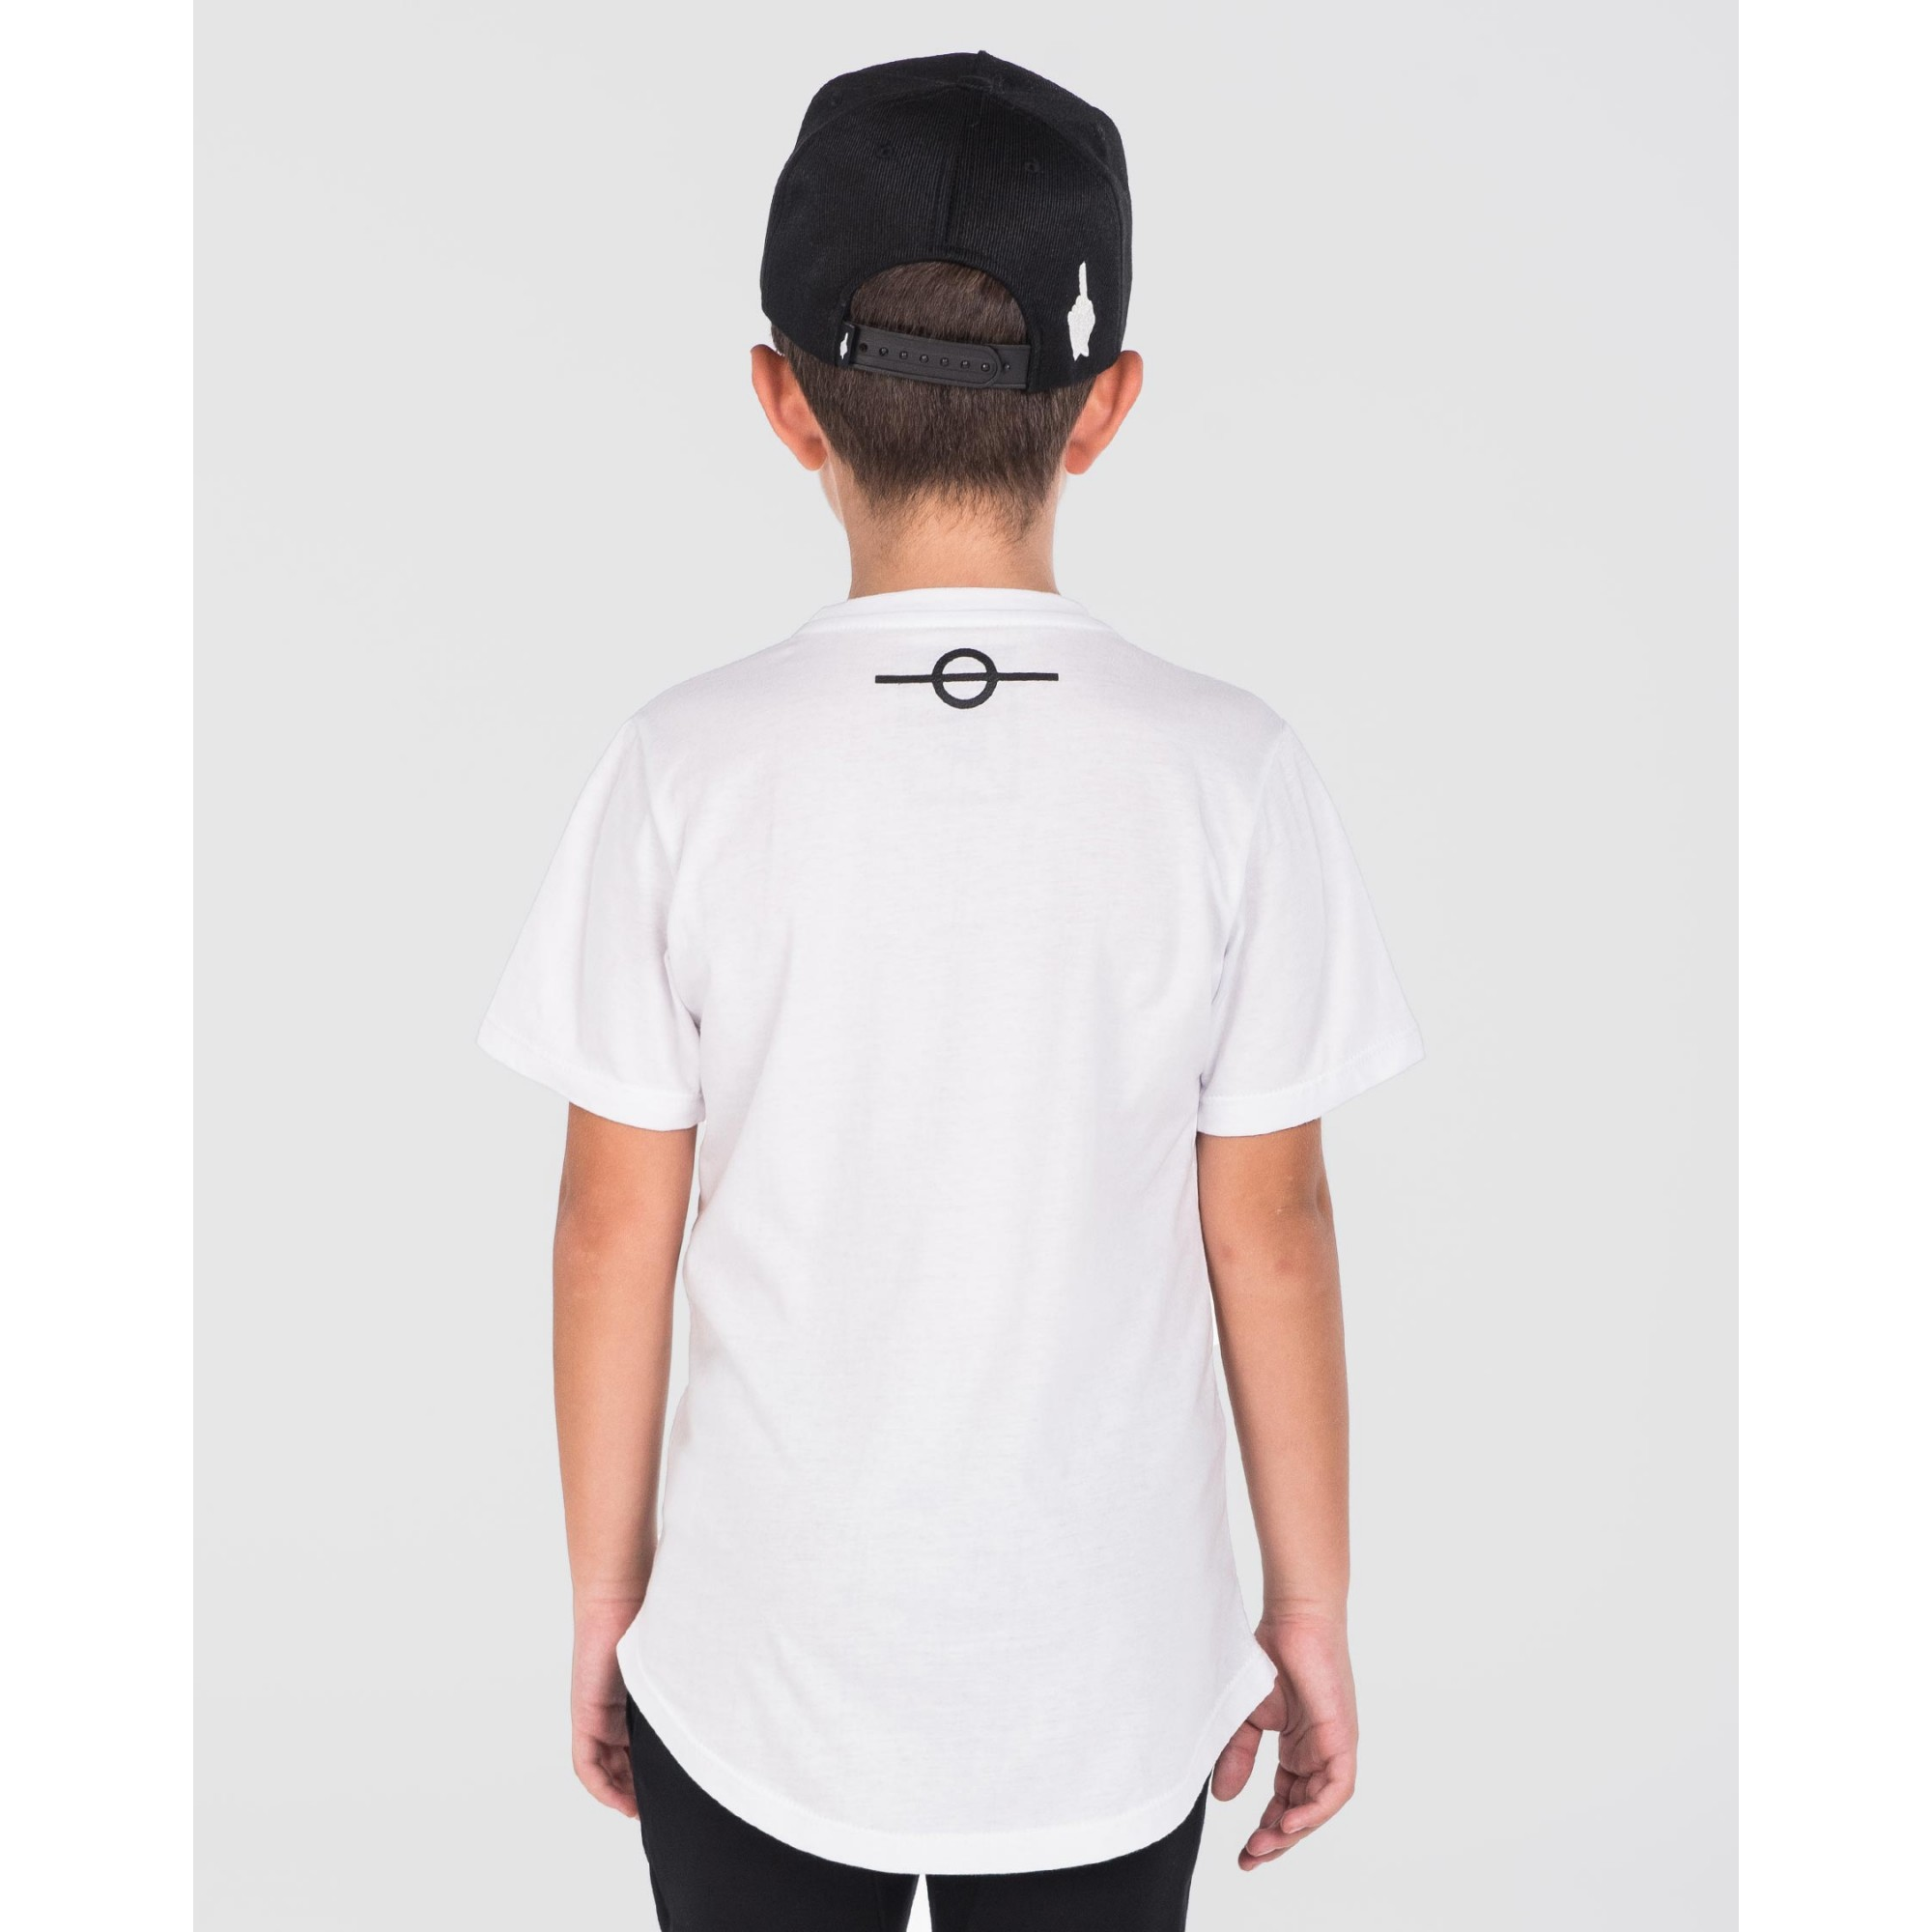 Camiseta Buh Kids Fire Relevo White